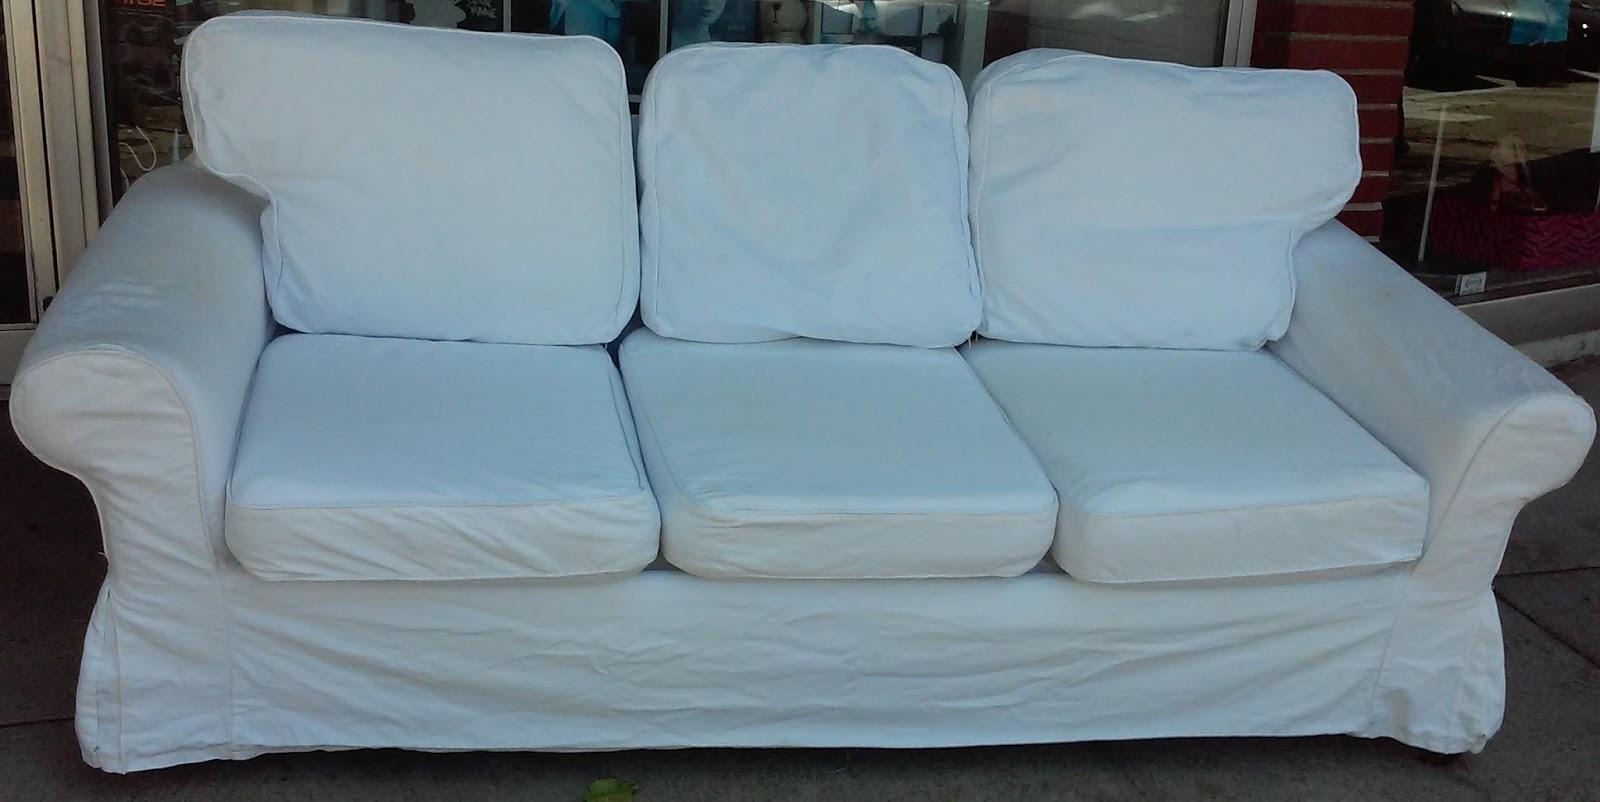 Uhuru Furniture Amp Collectibles Sold Seven Foot Ikea Slip